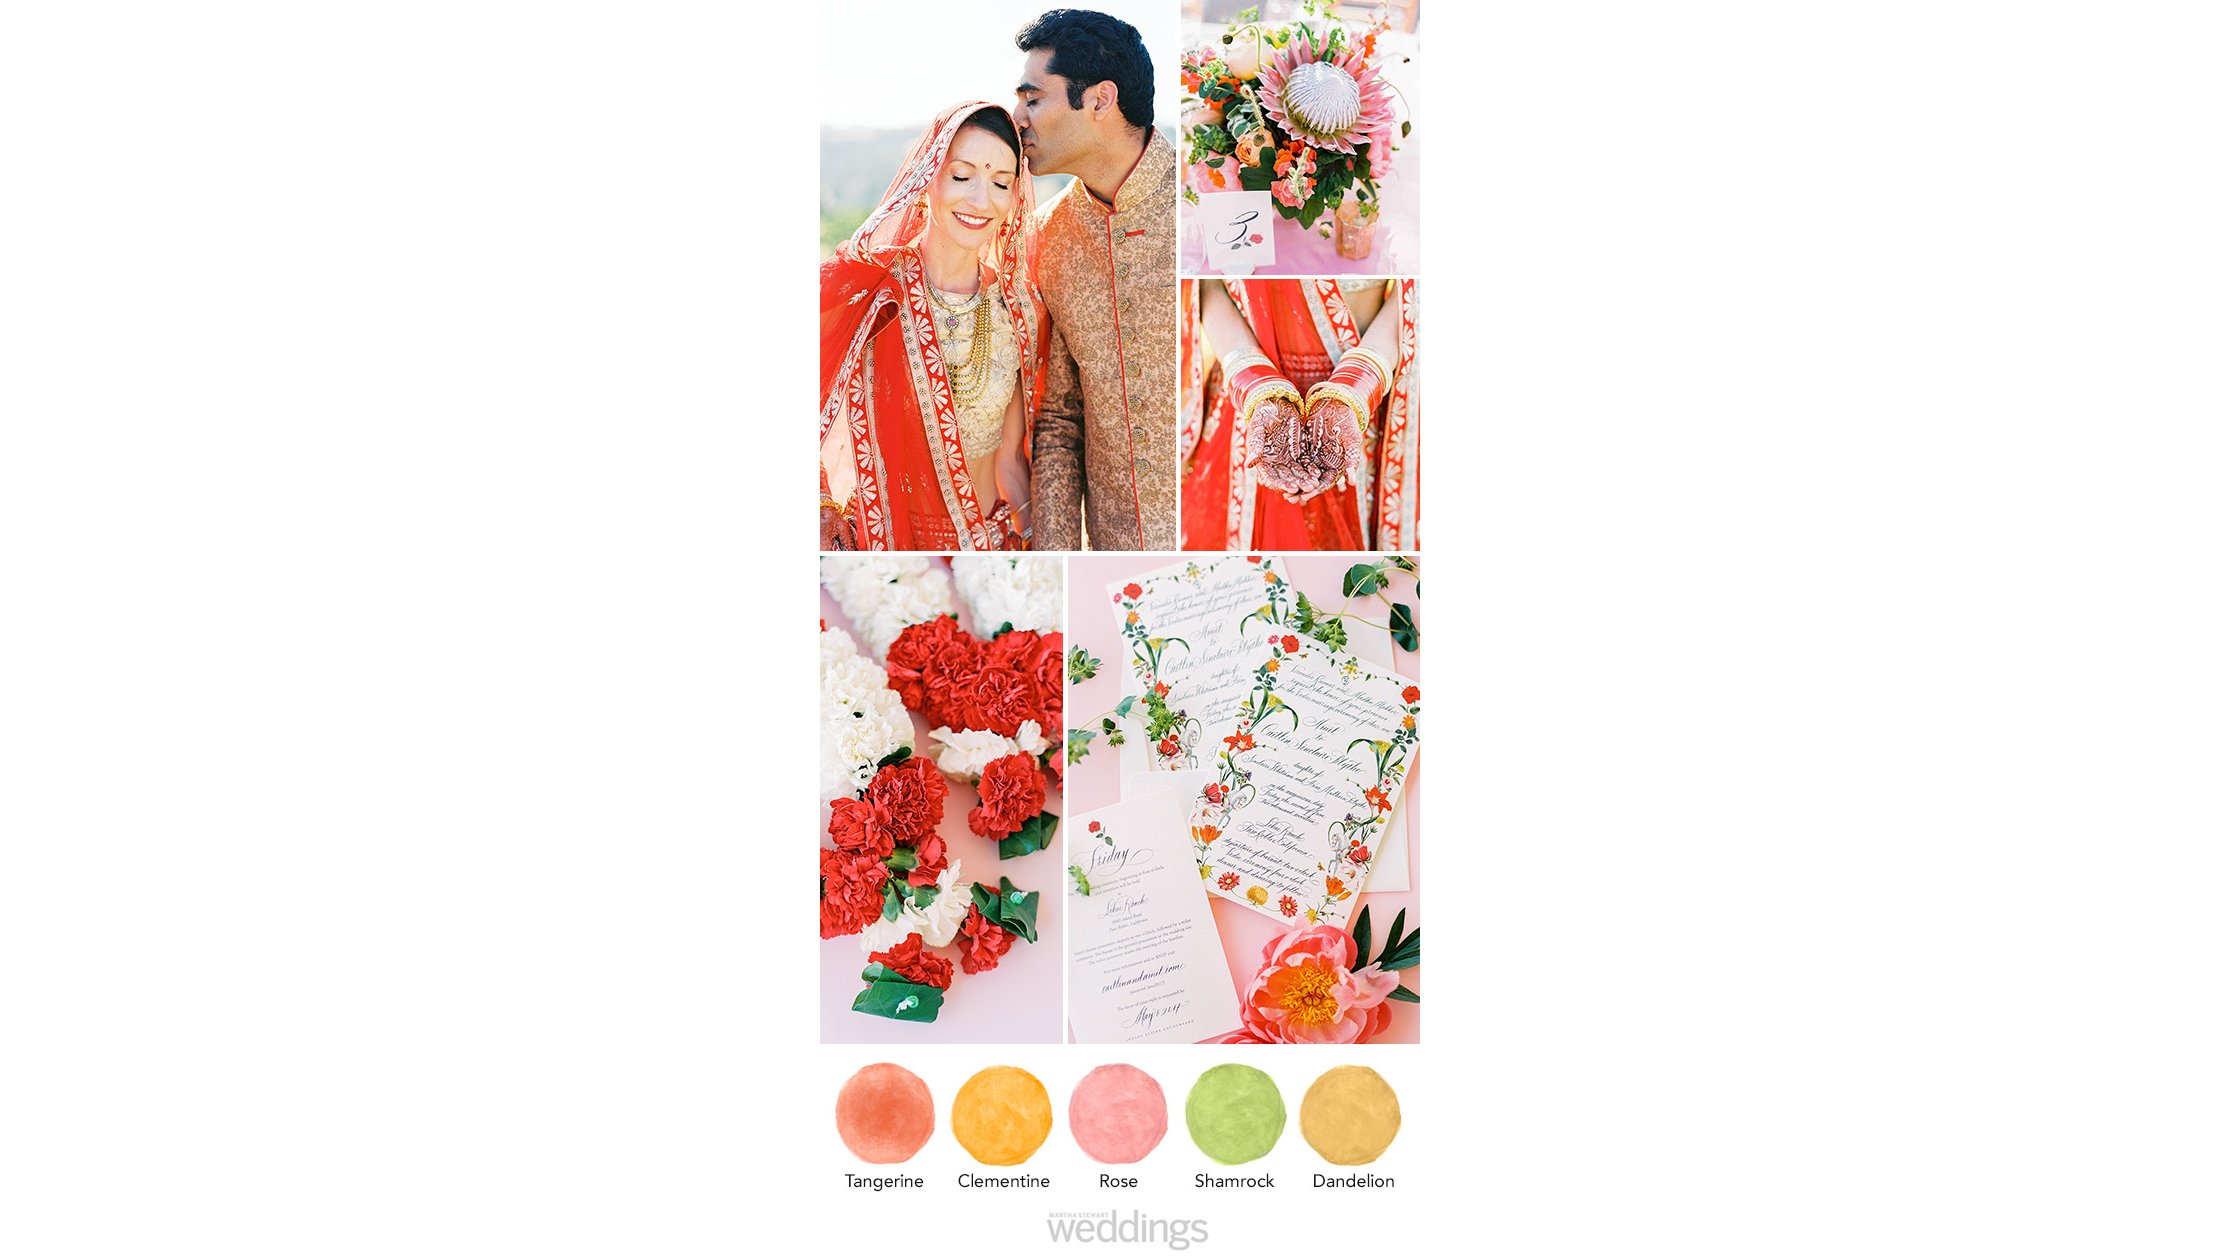 tangerine rose wedding color palette ideas